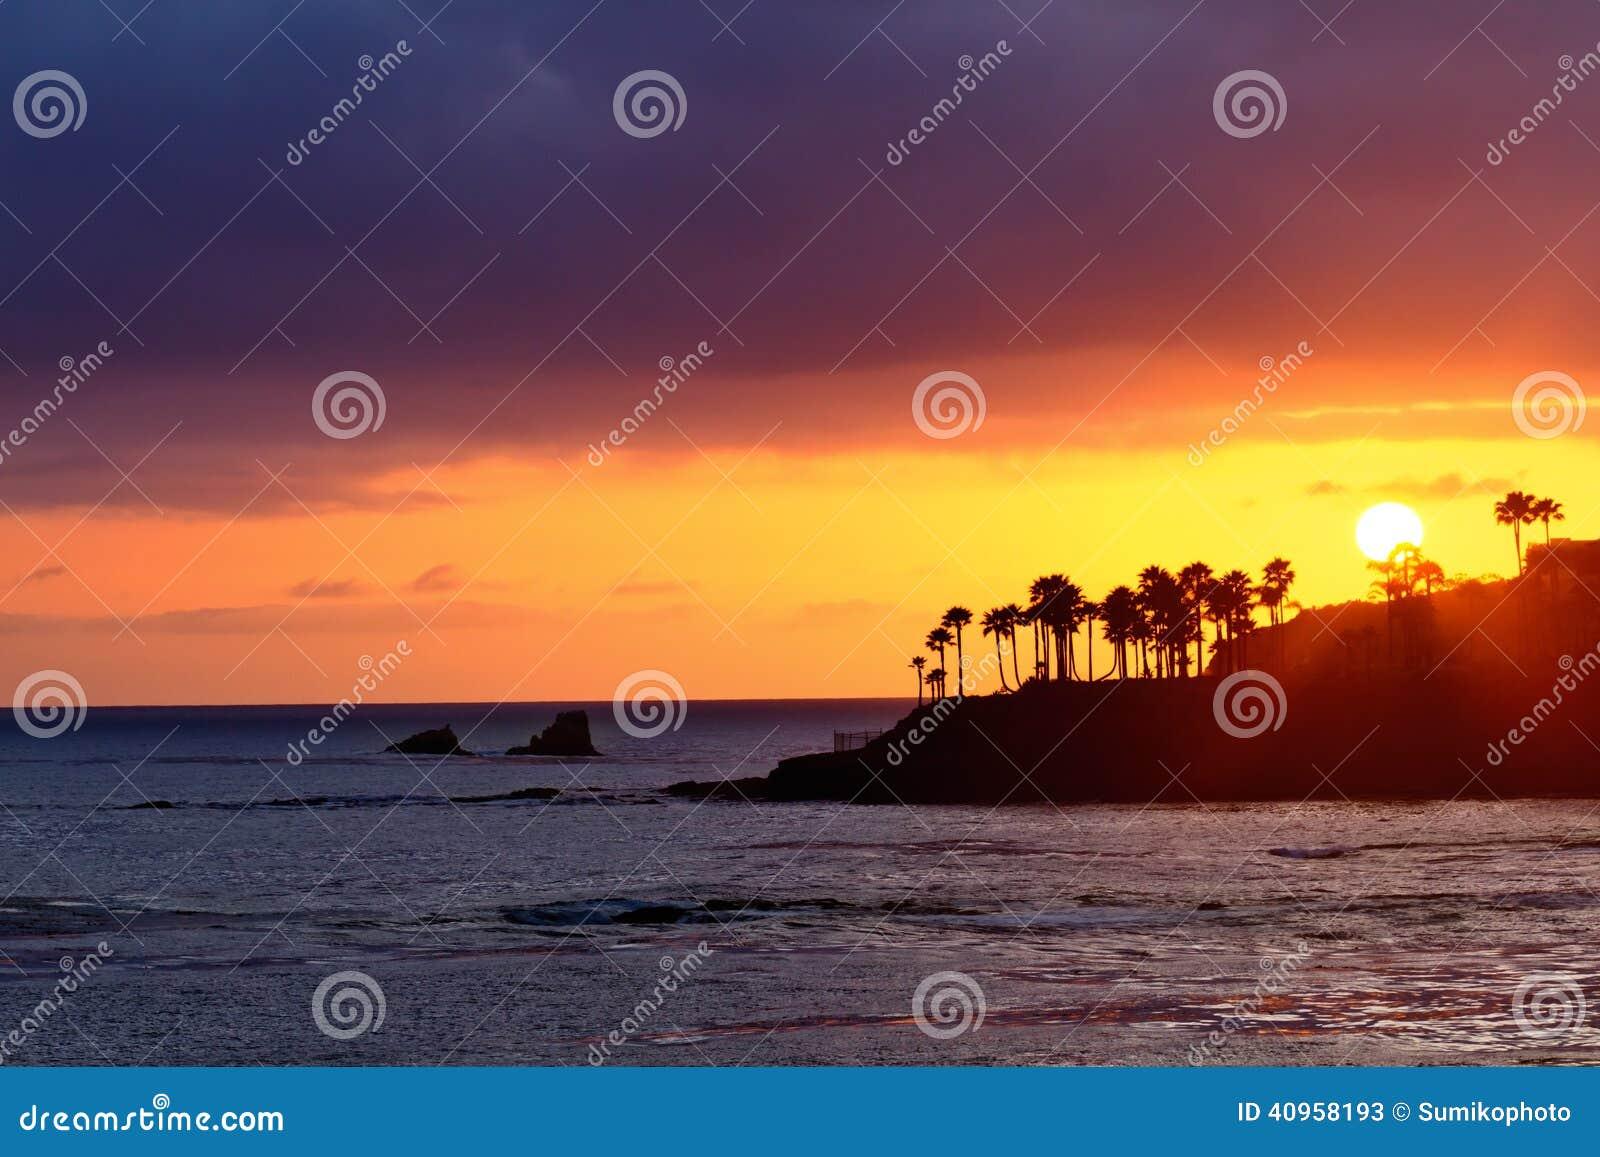 Strandlaguna solnedgång